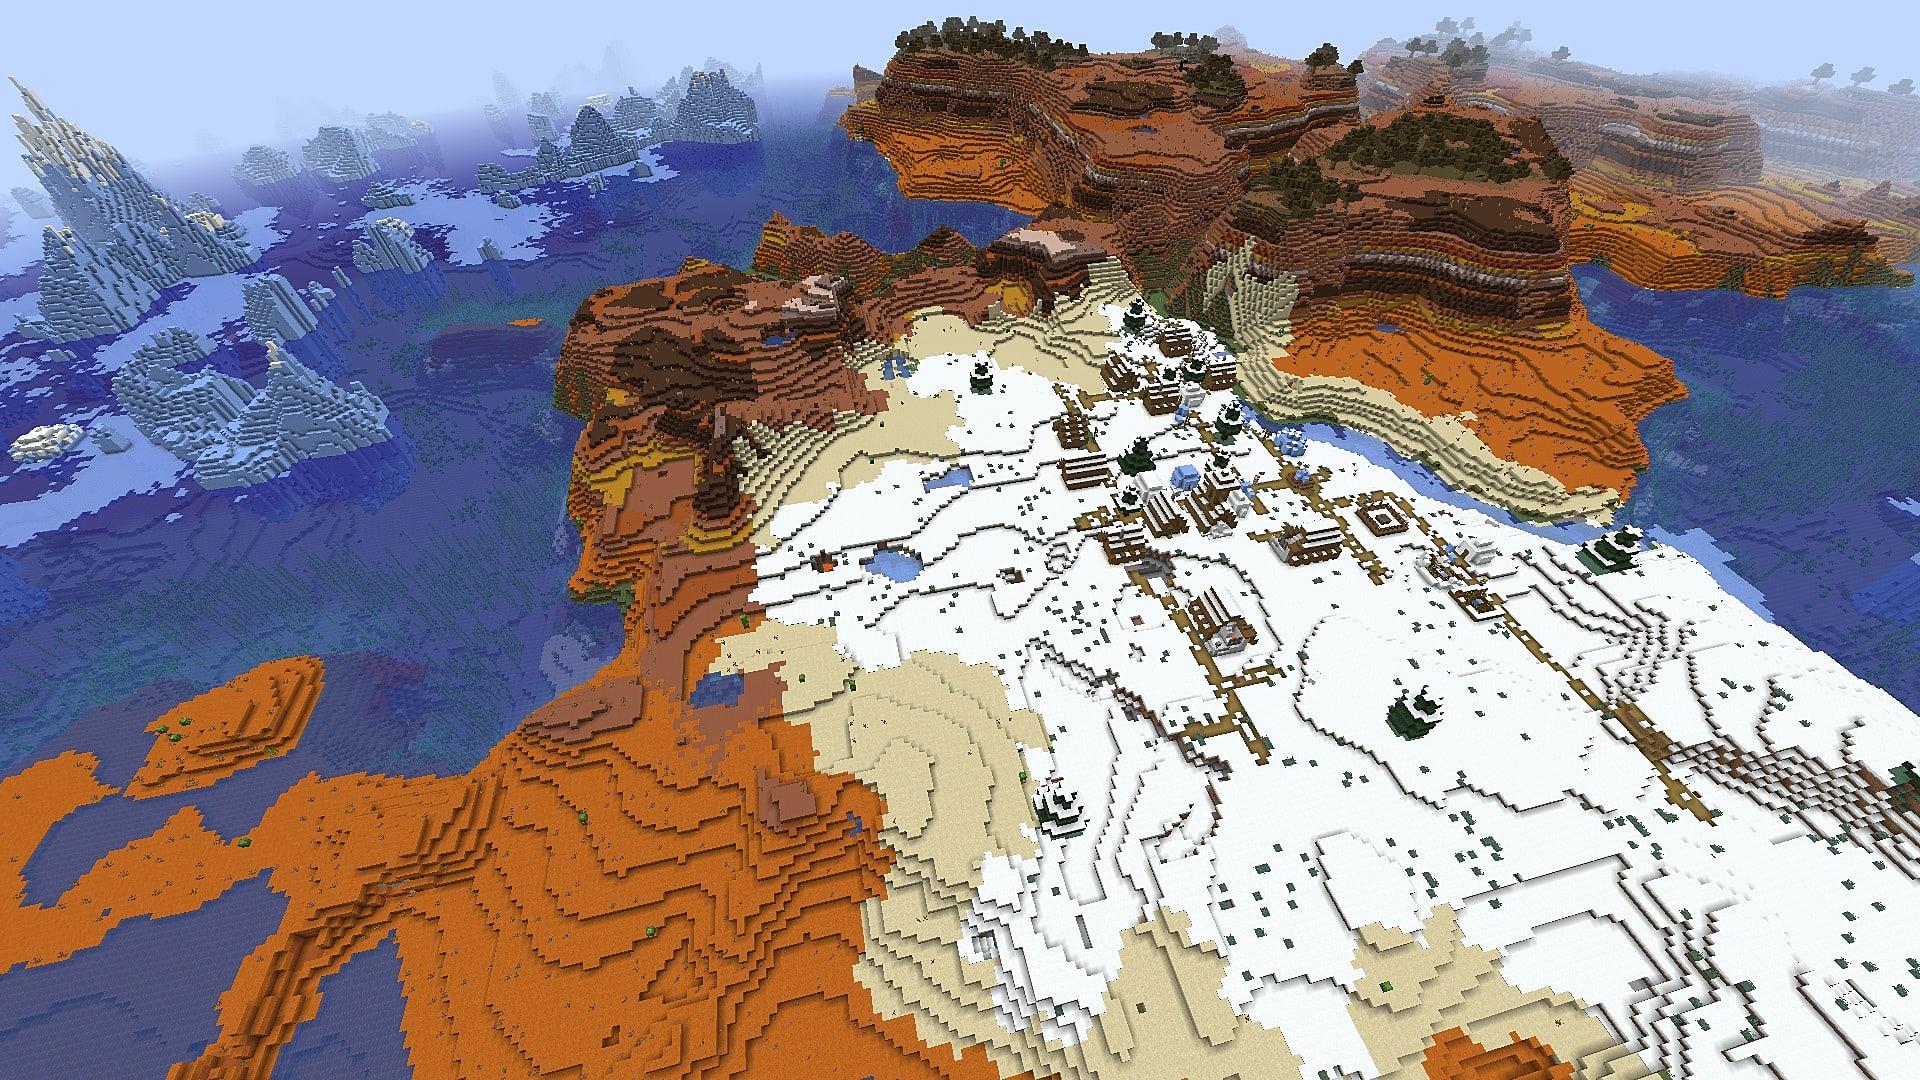 Top 1111 Minecraft 11.111.11 Seeds for October 11111111  Slide 11  Minecraft